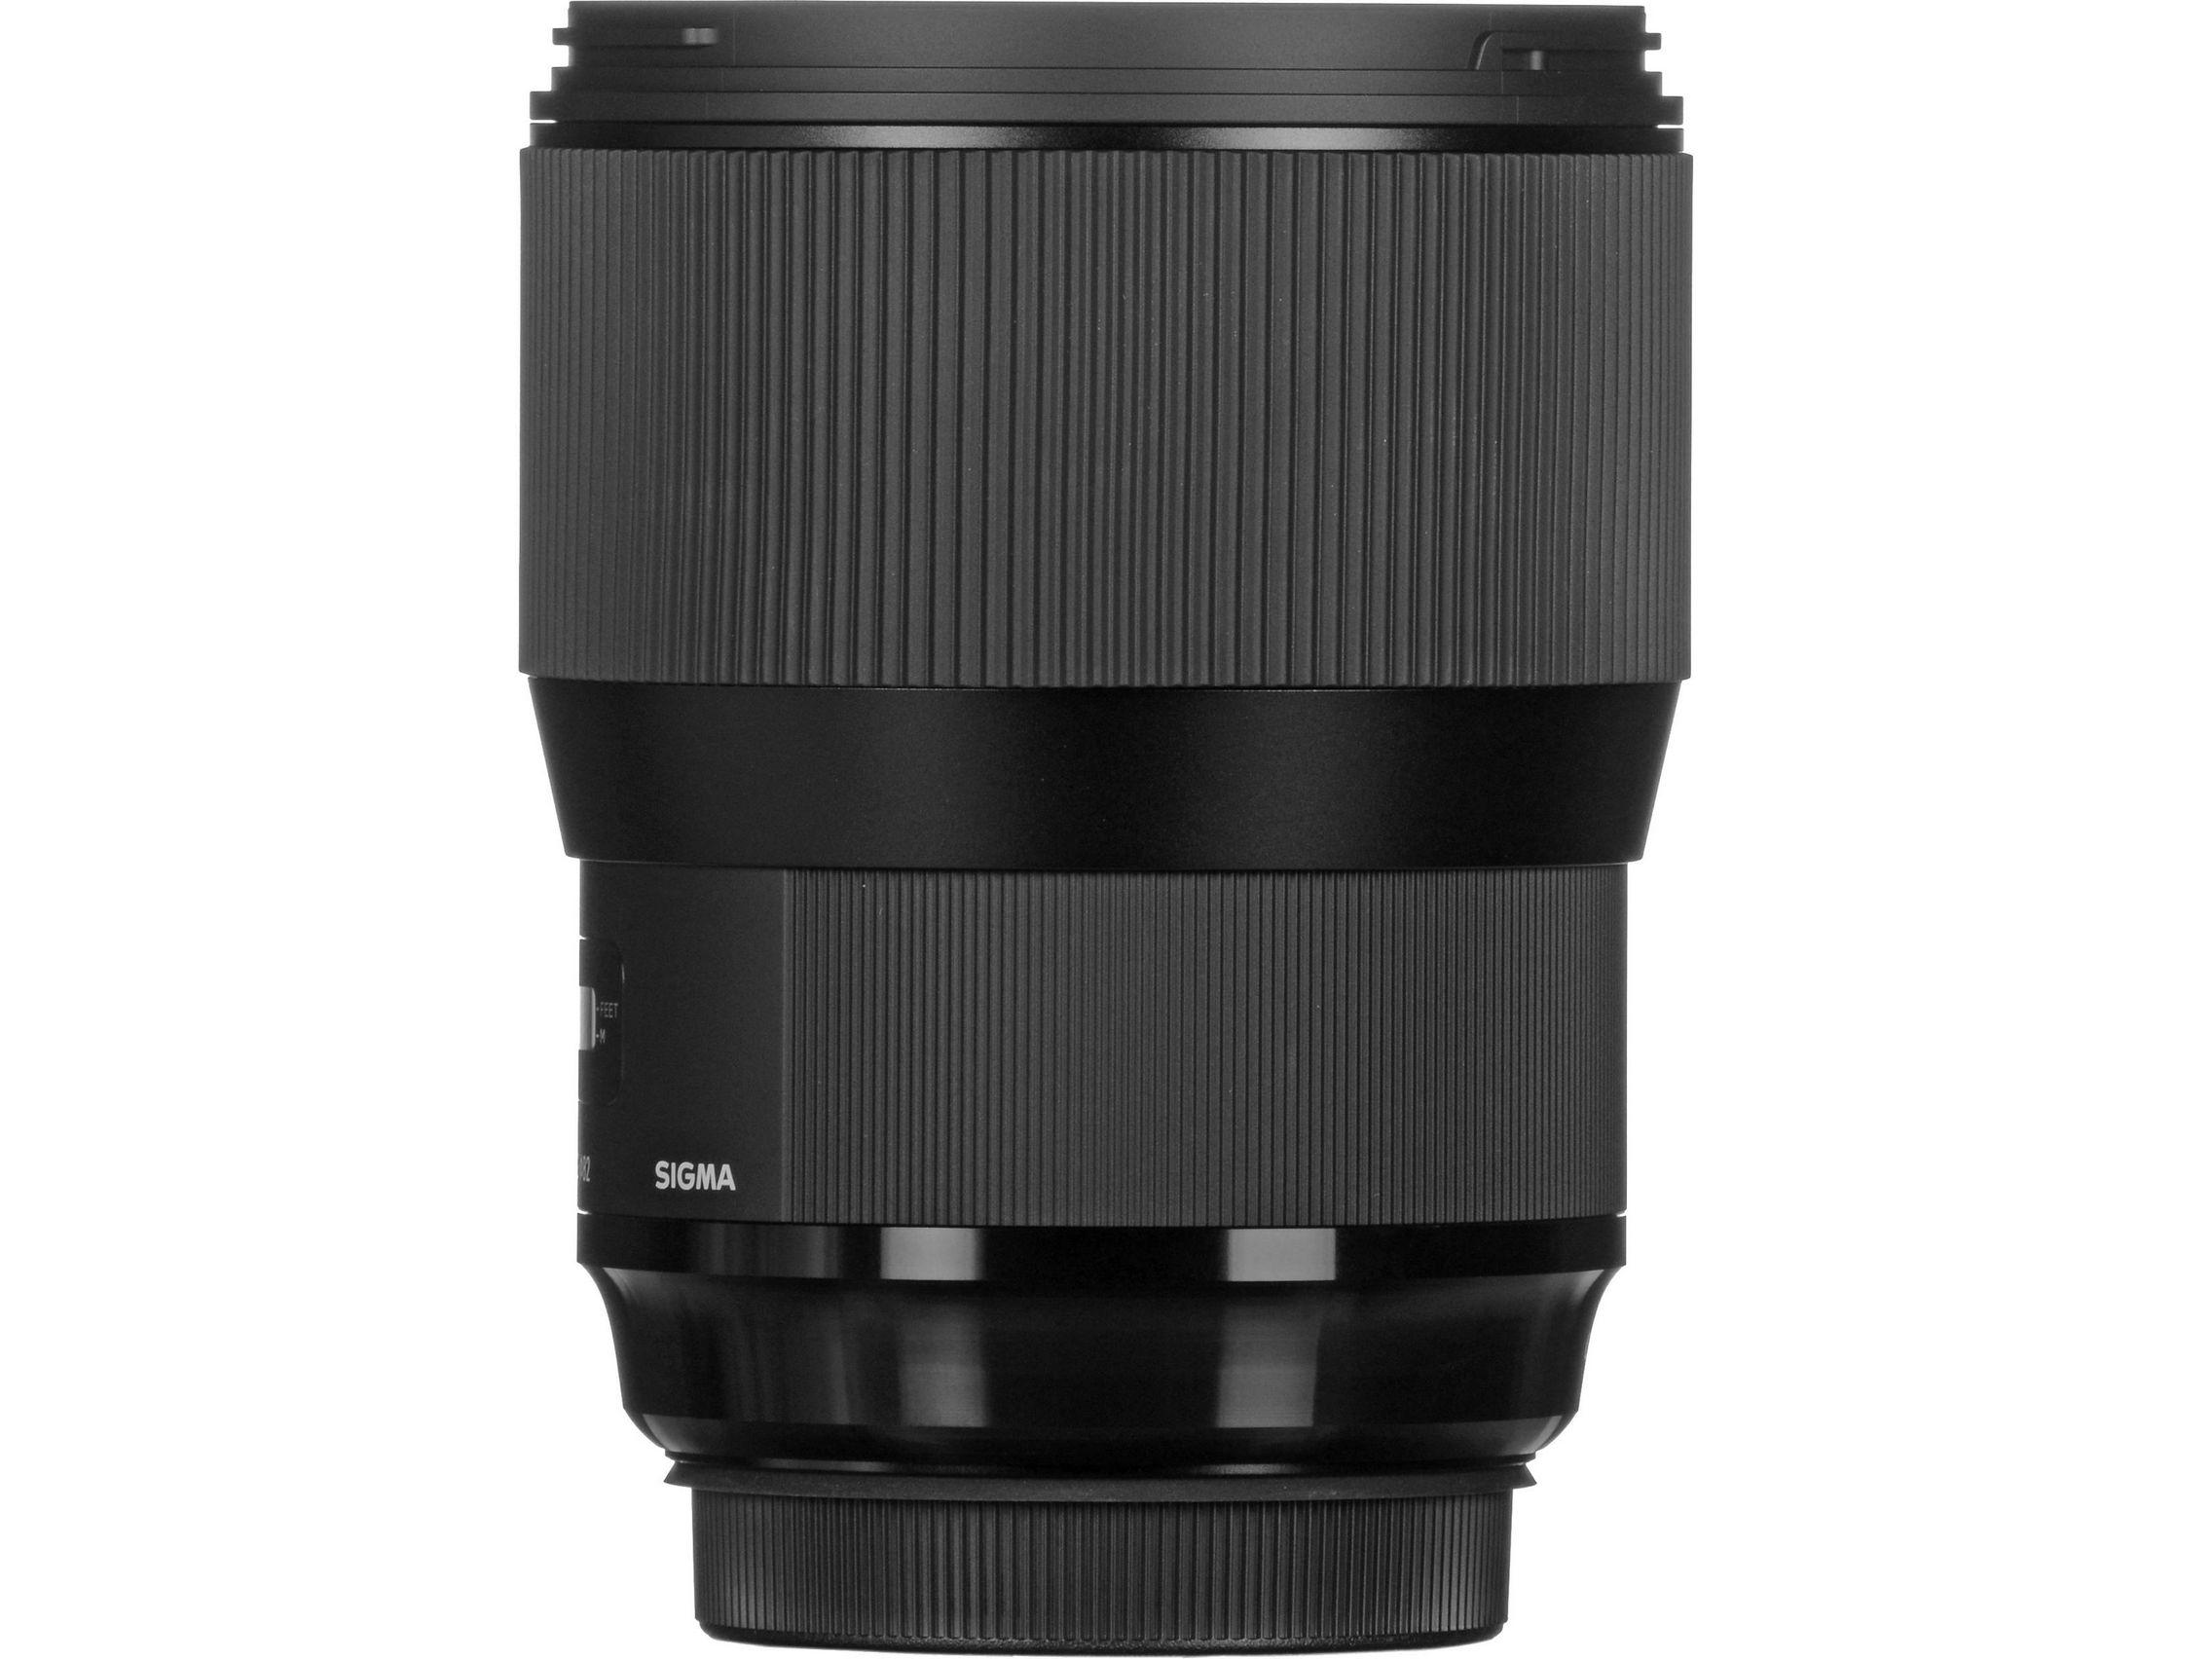 Sigma 135mm 1:1.8 DG A (ART)